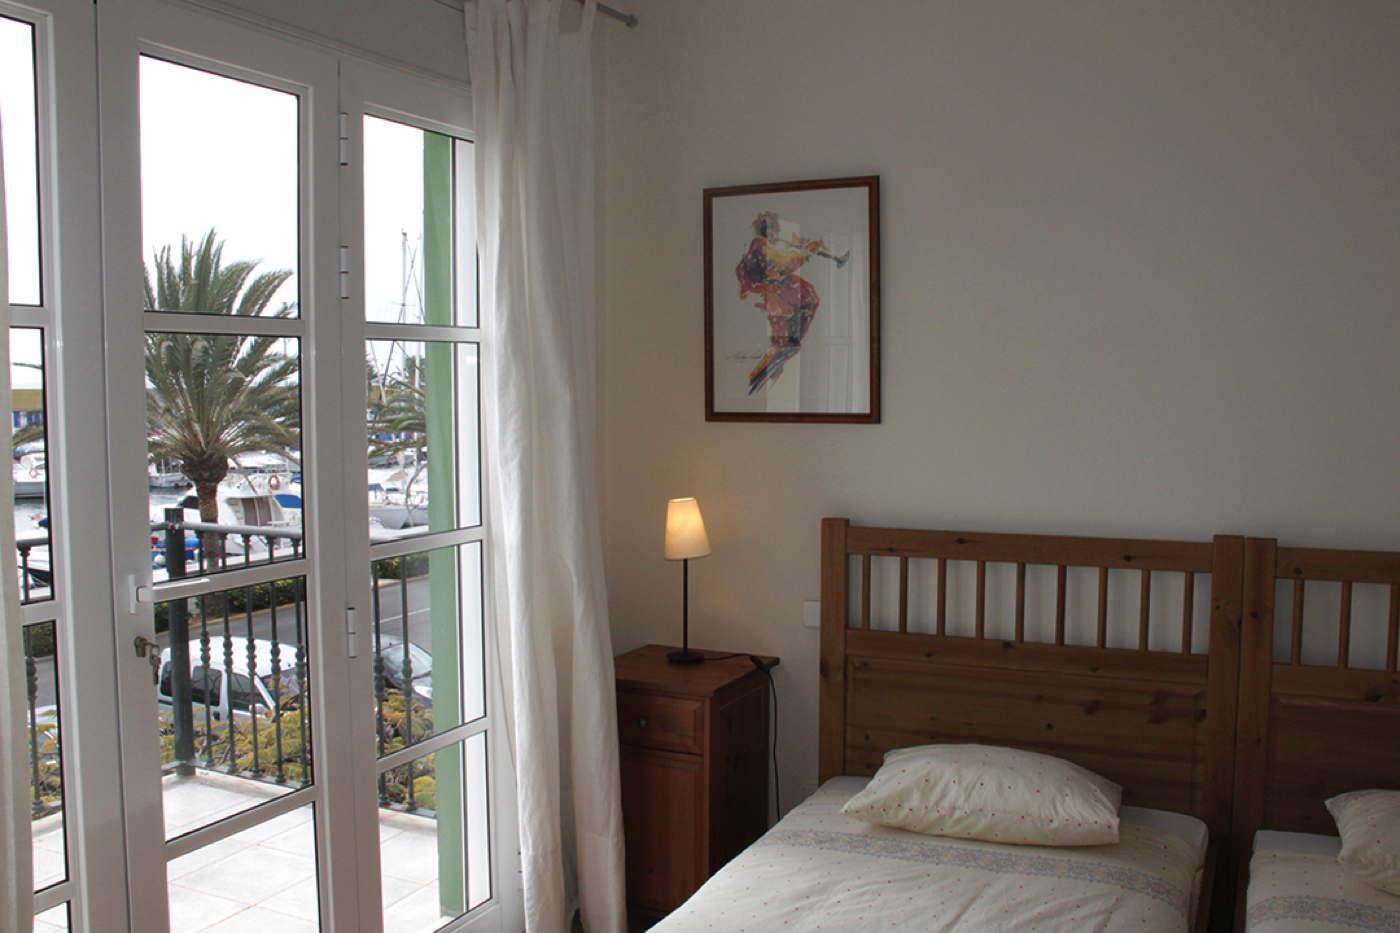 ferienhaus f r golfer und segler gran canaria mieten. Black Bedroom Furniture Sets. Home Design Ideas